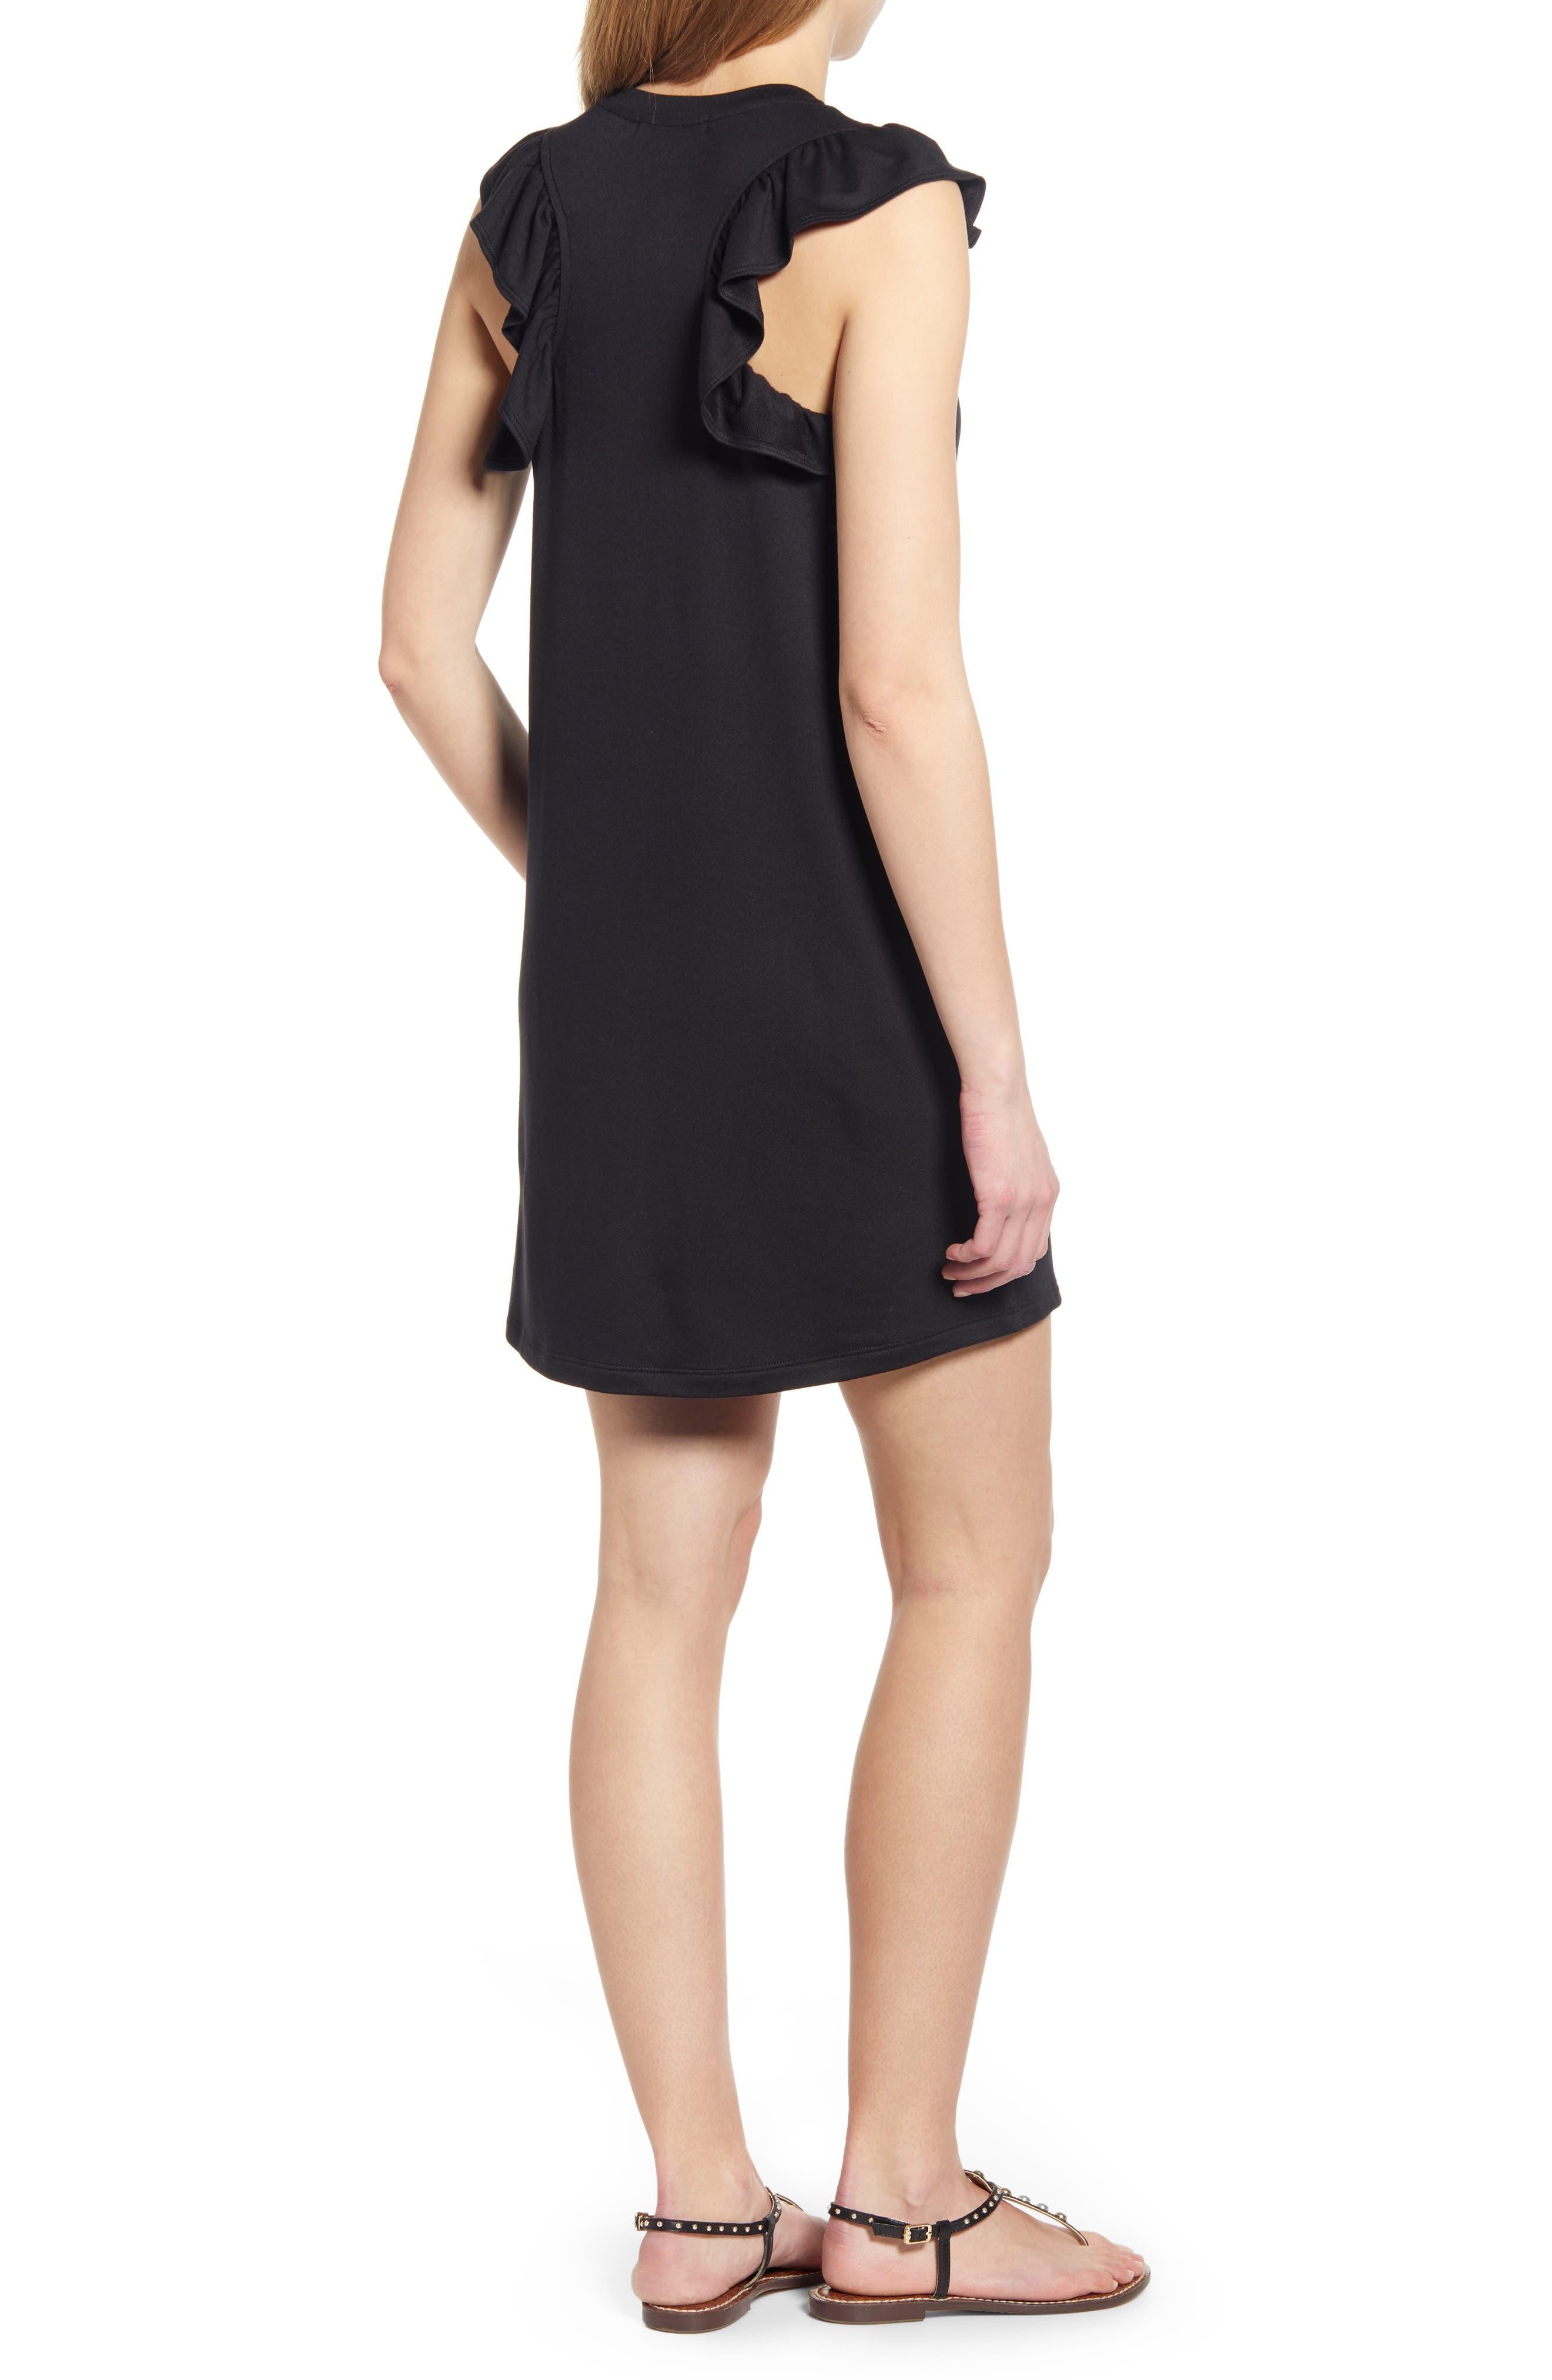 GIBSON, x Hi Sugarplum! Laguna Soft Jersey Ruffle Back T-Shirt Dress, Alternate thumbnail 2, color, BLACK